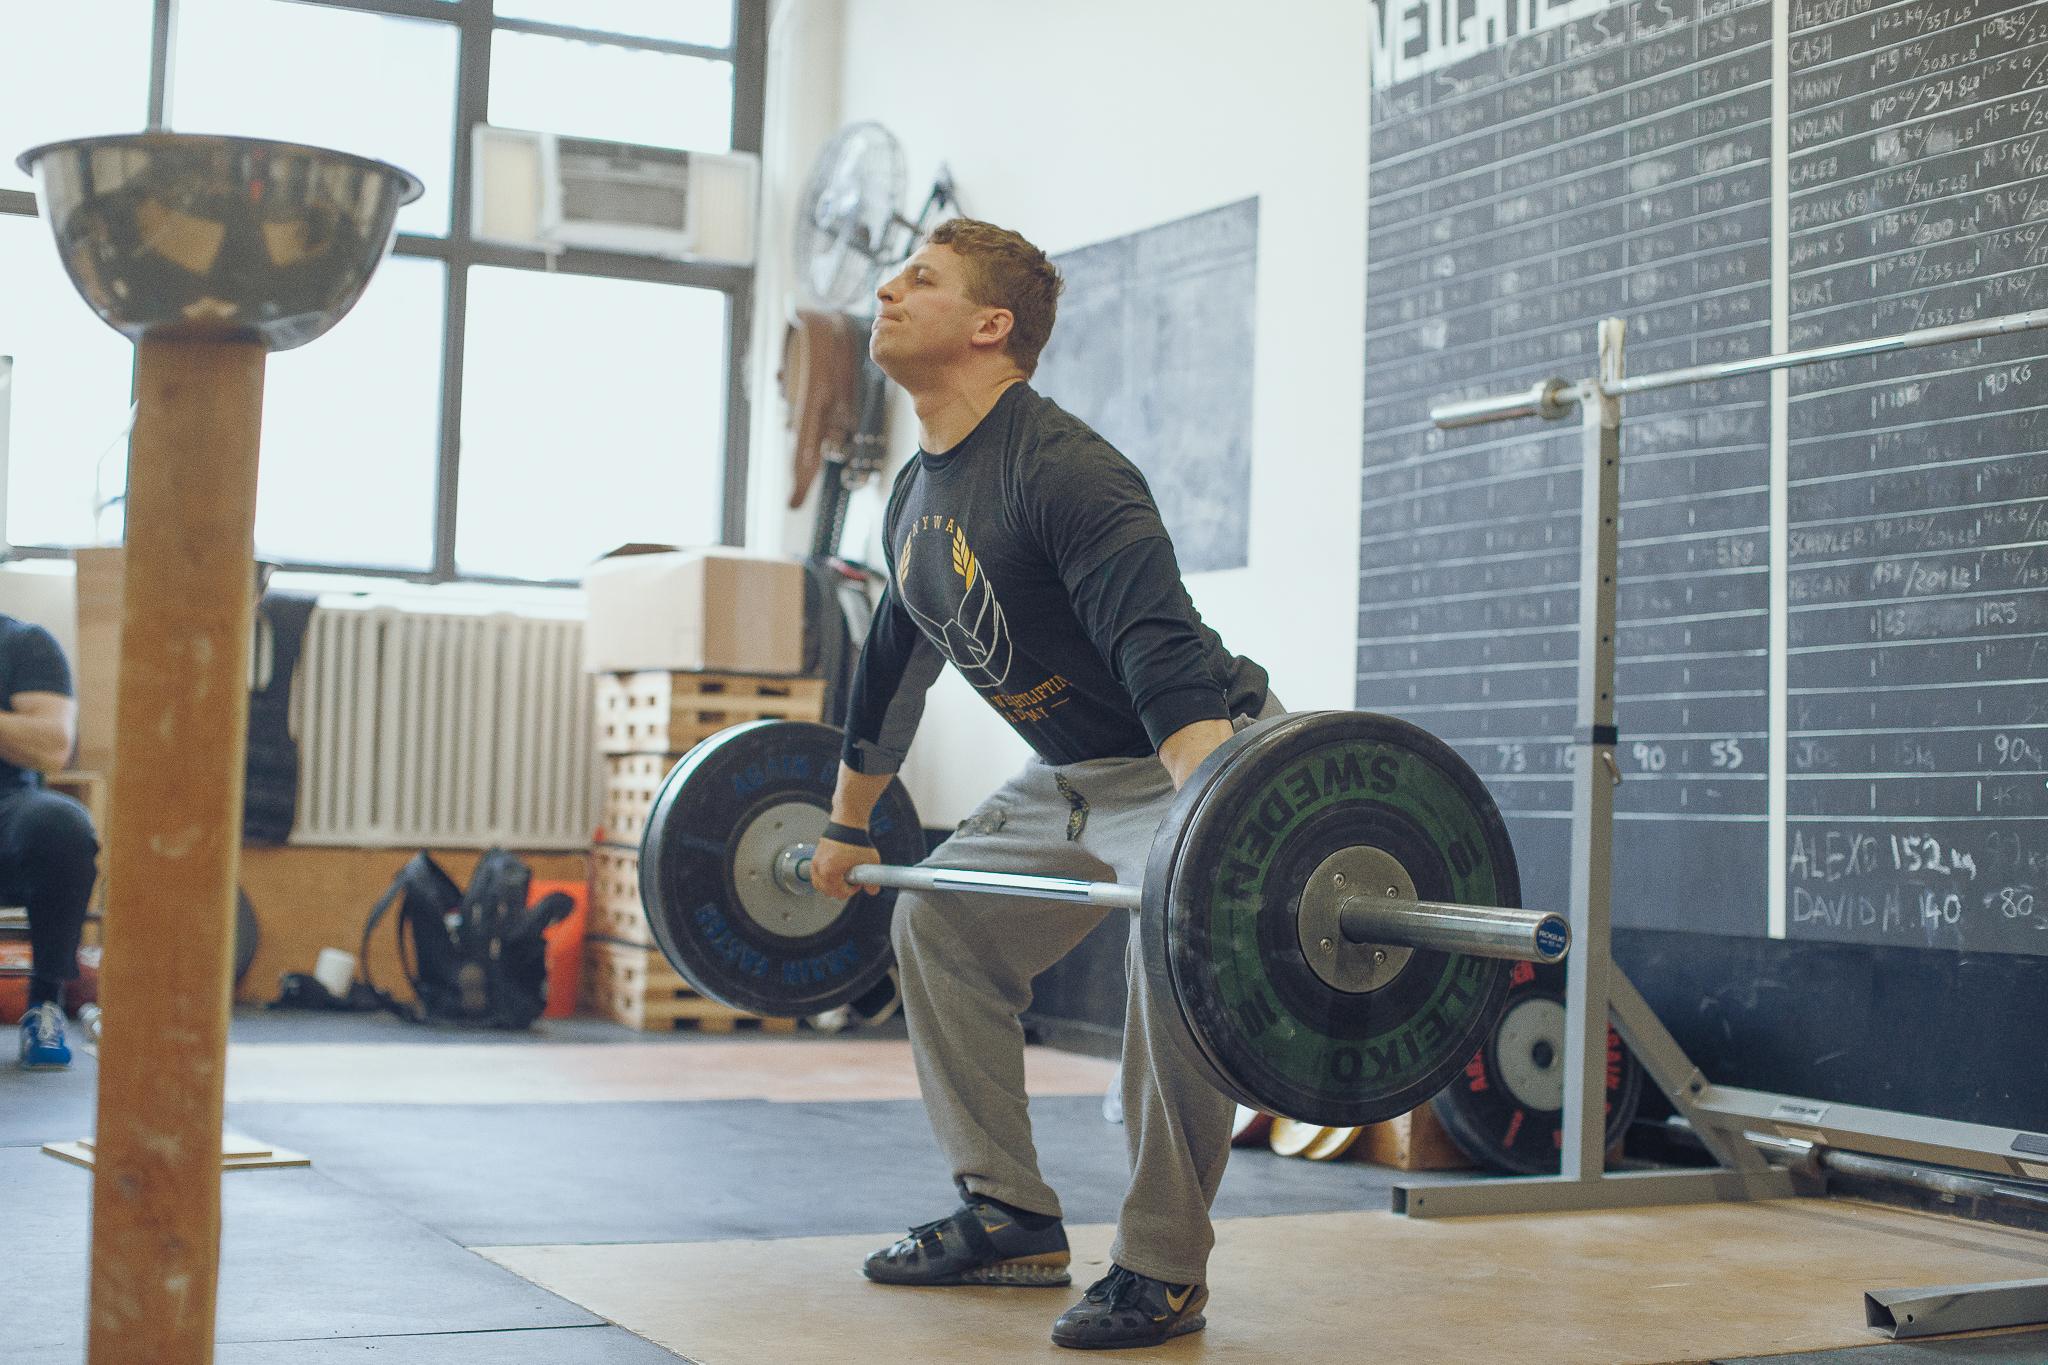 dan-casey-nywa-jdi-visit-weightlifting-coach-new-york-weightlifting-academy-18.jpg